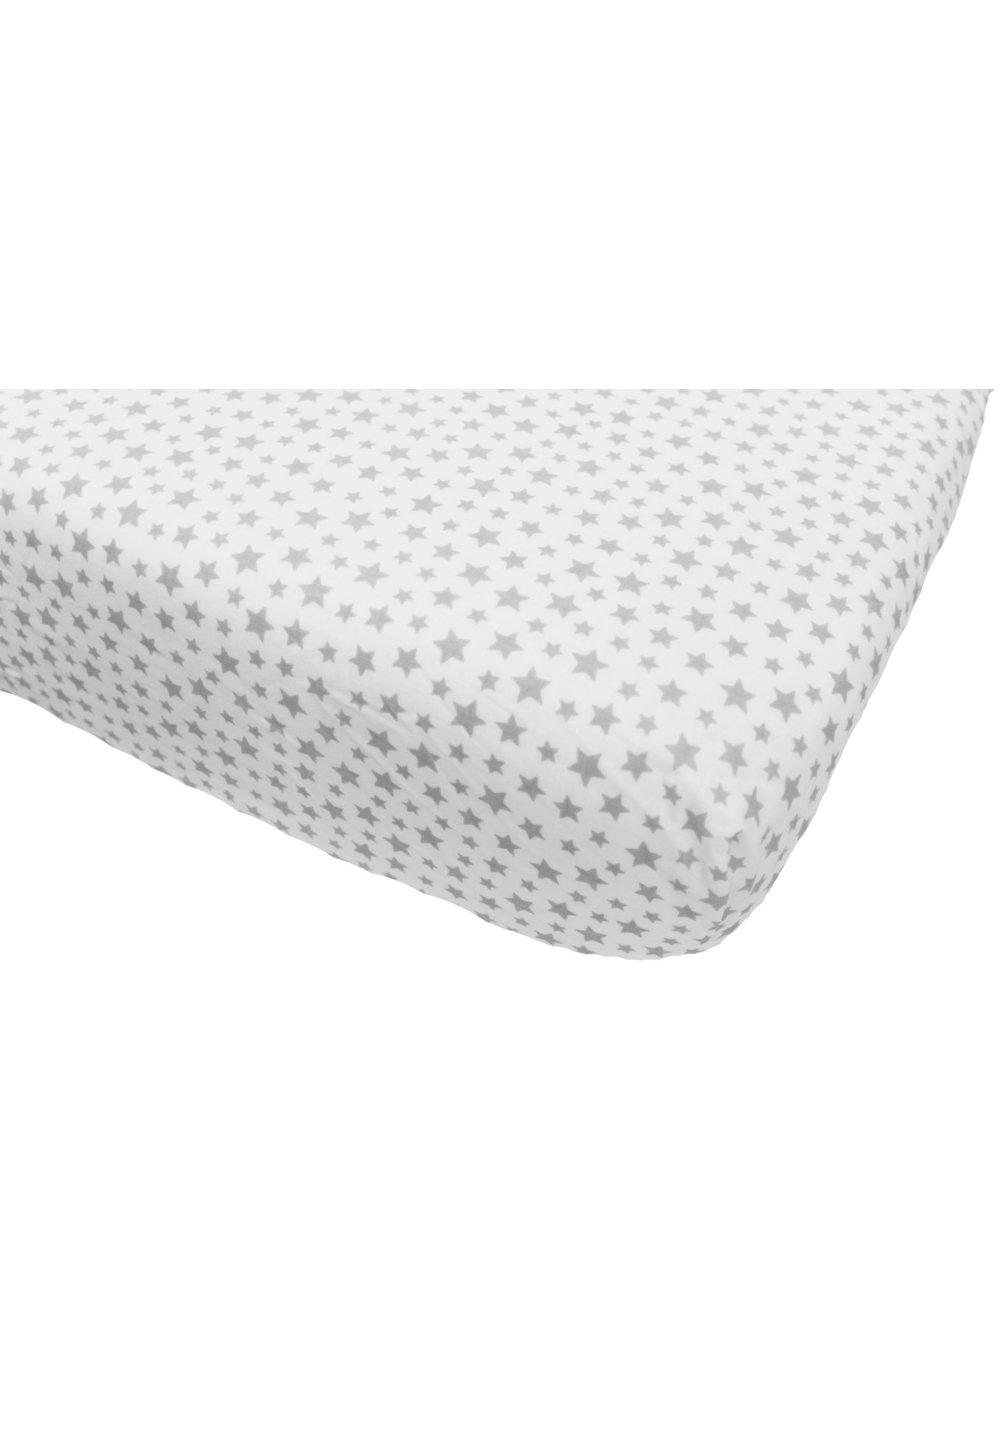 Cearceaf bumbac, alb cu stelute gri, 120x60 cm imagine